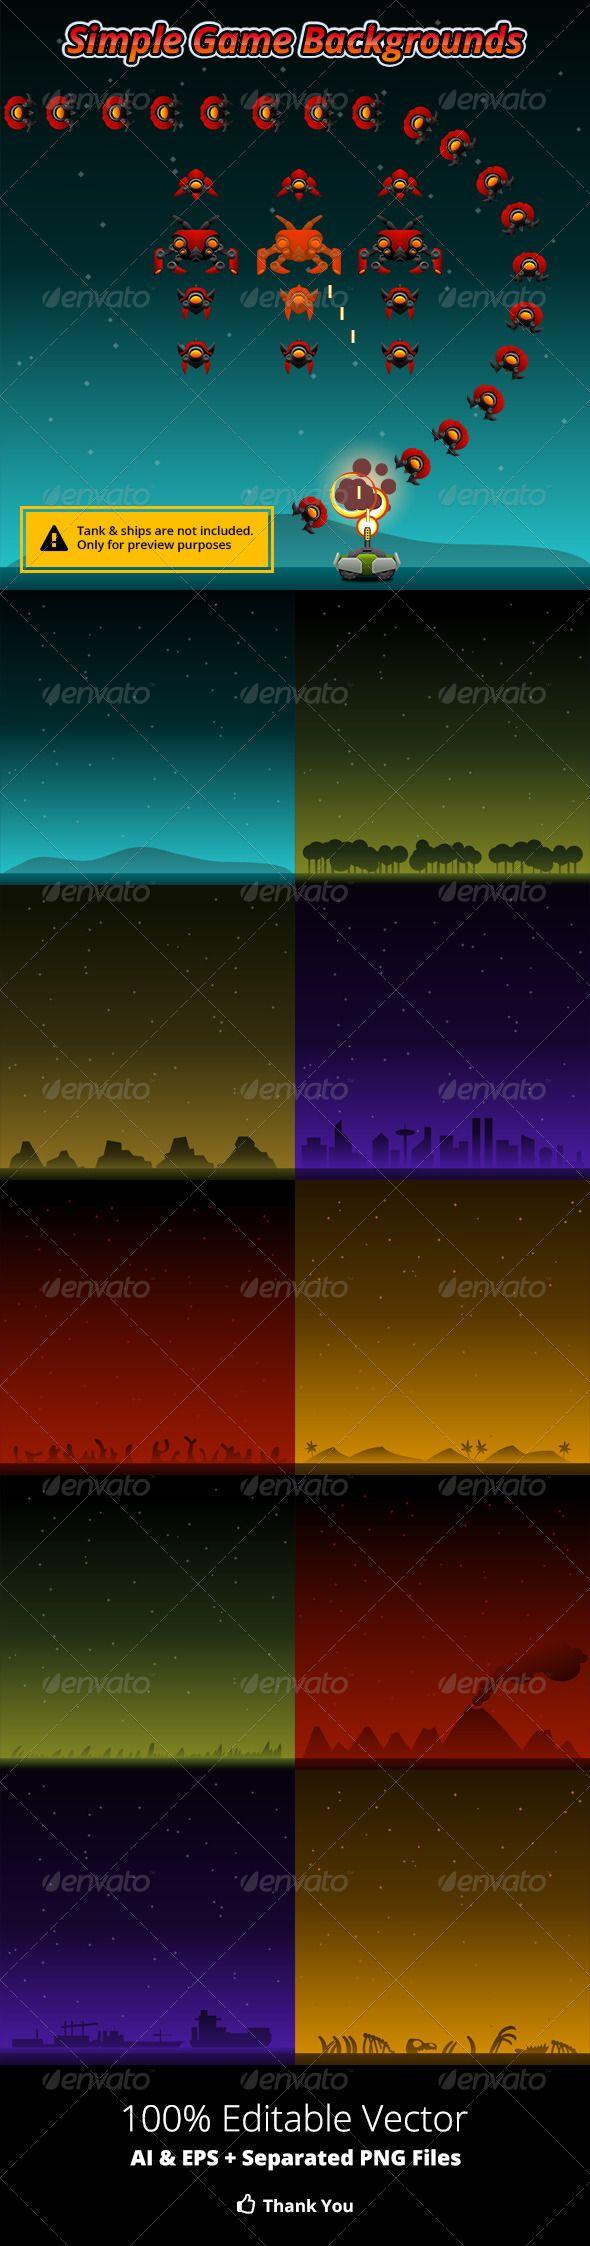 realistic graphic download ai psd http vector graphic de